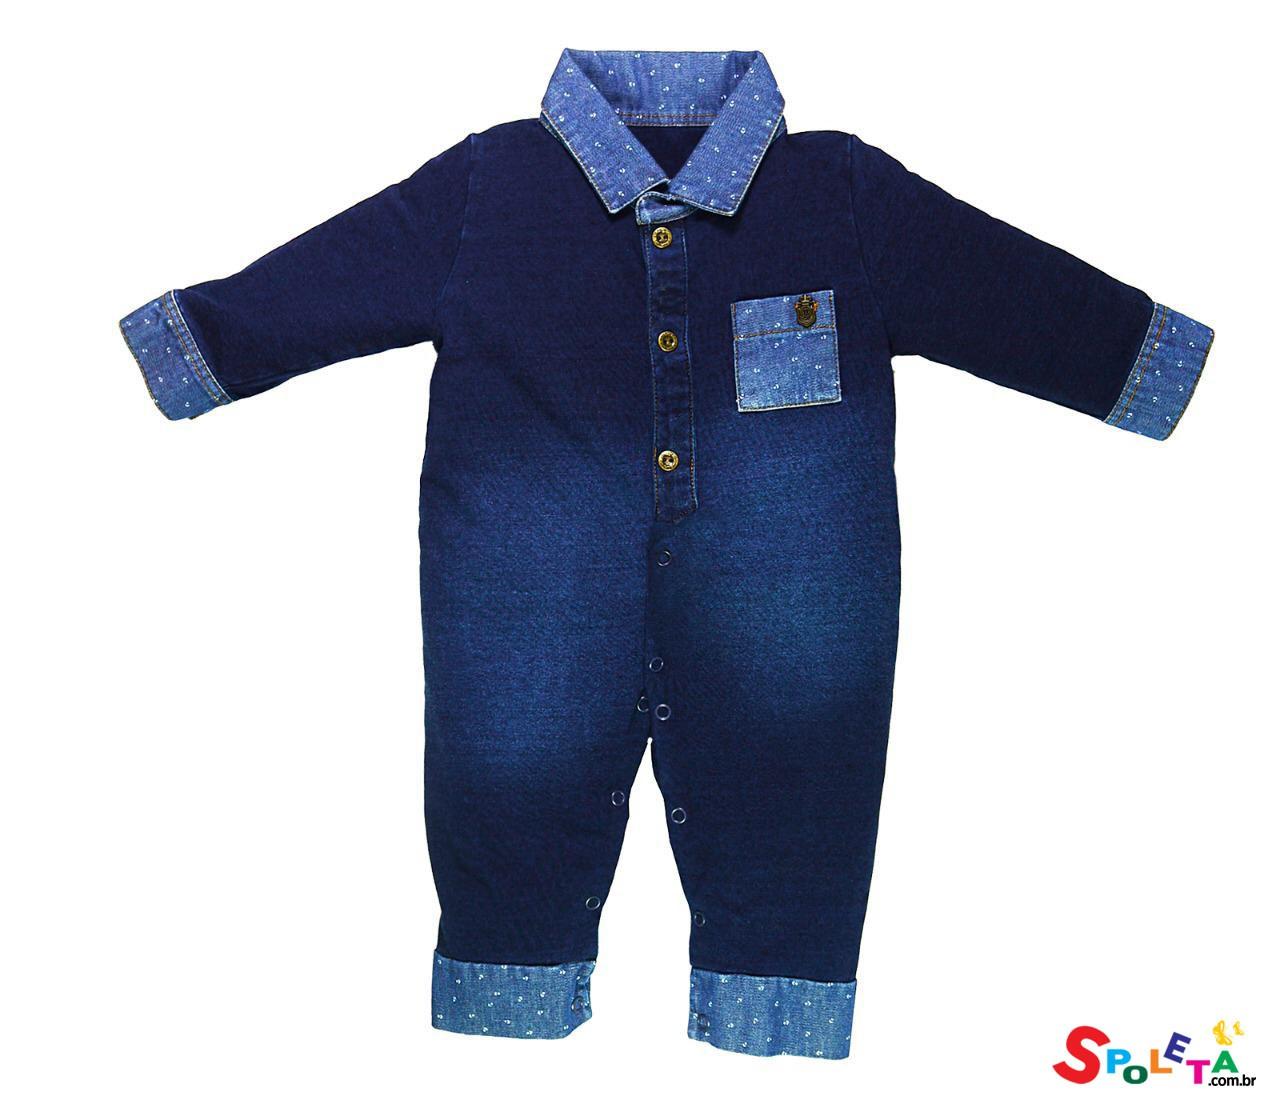 Macacão longo masculino jeans